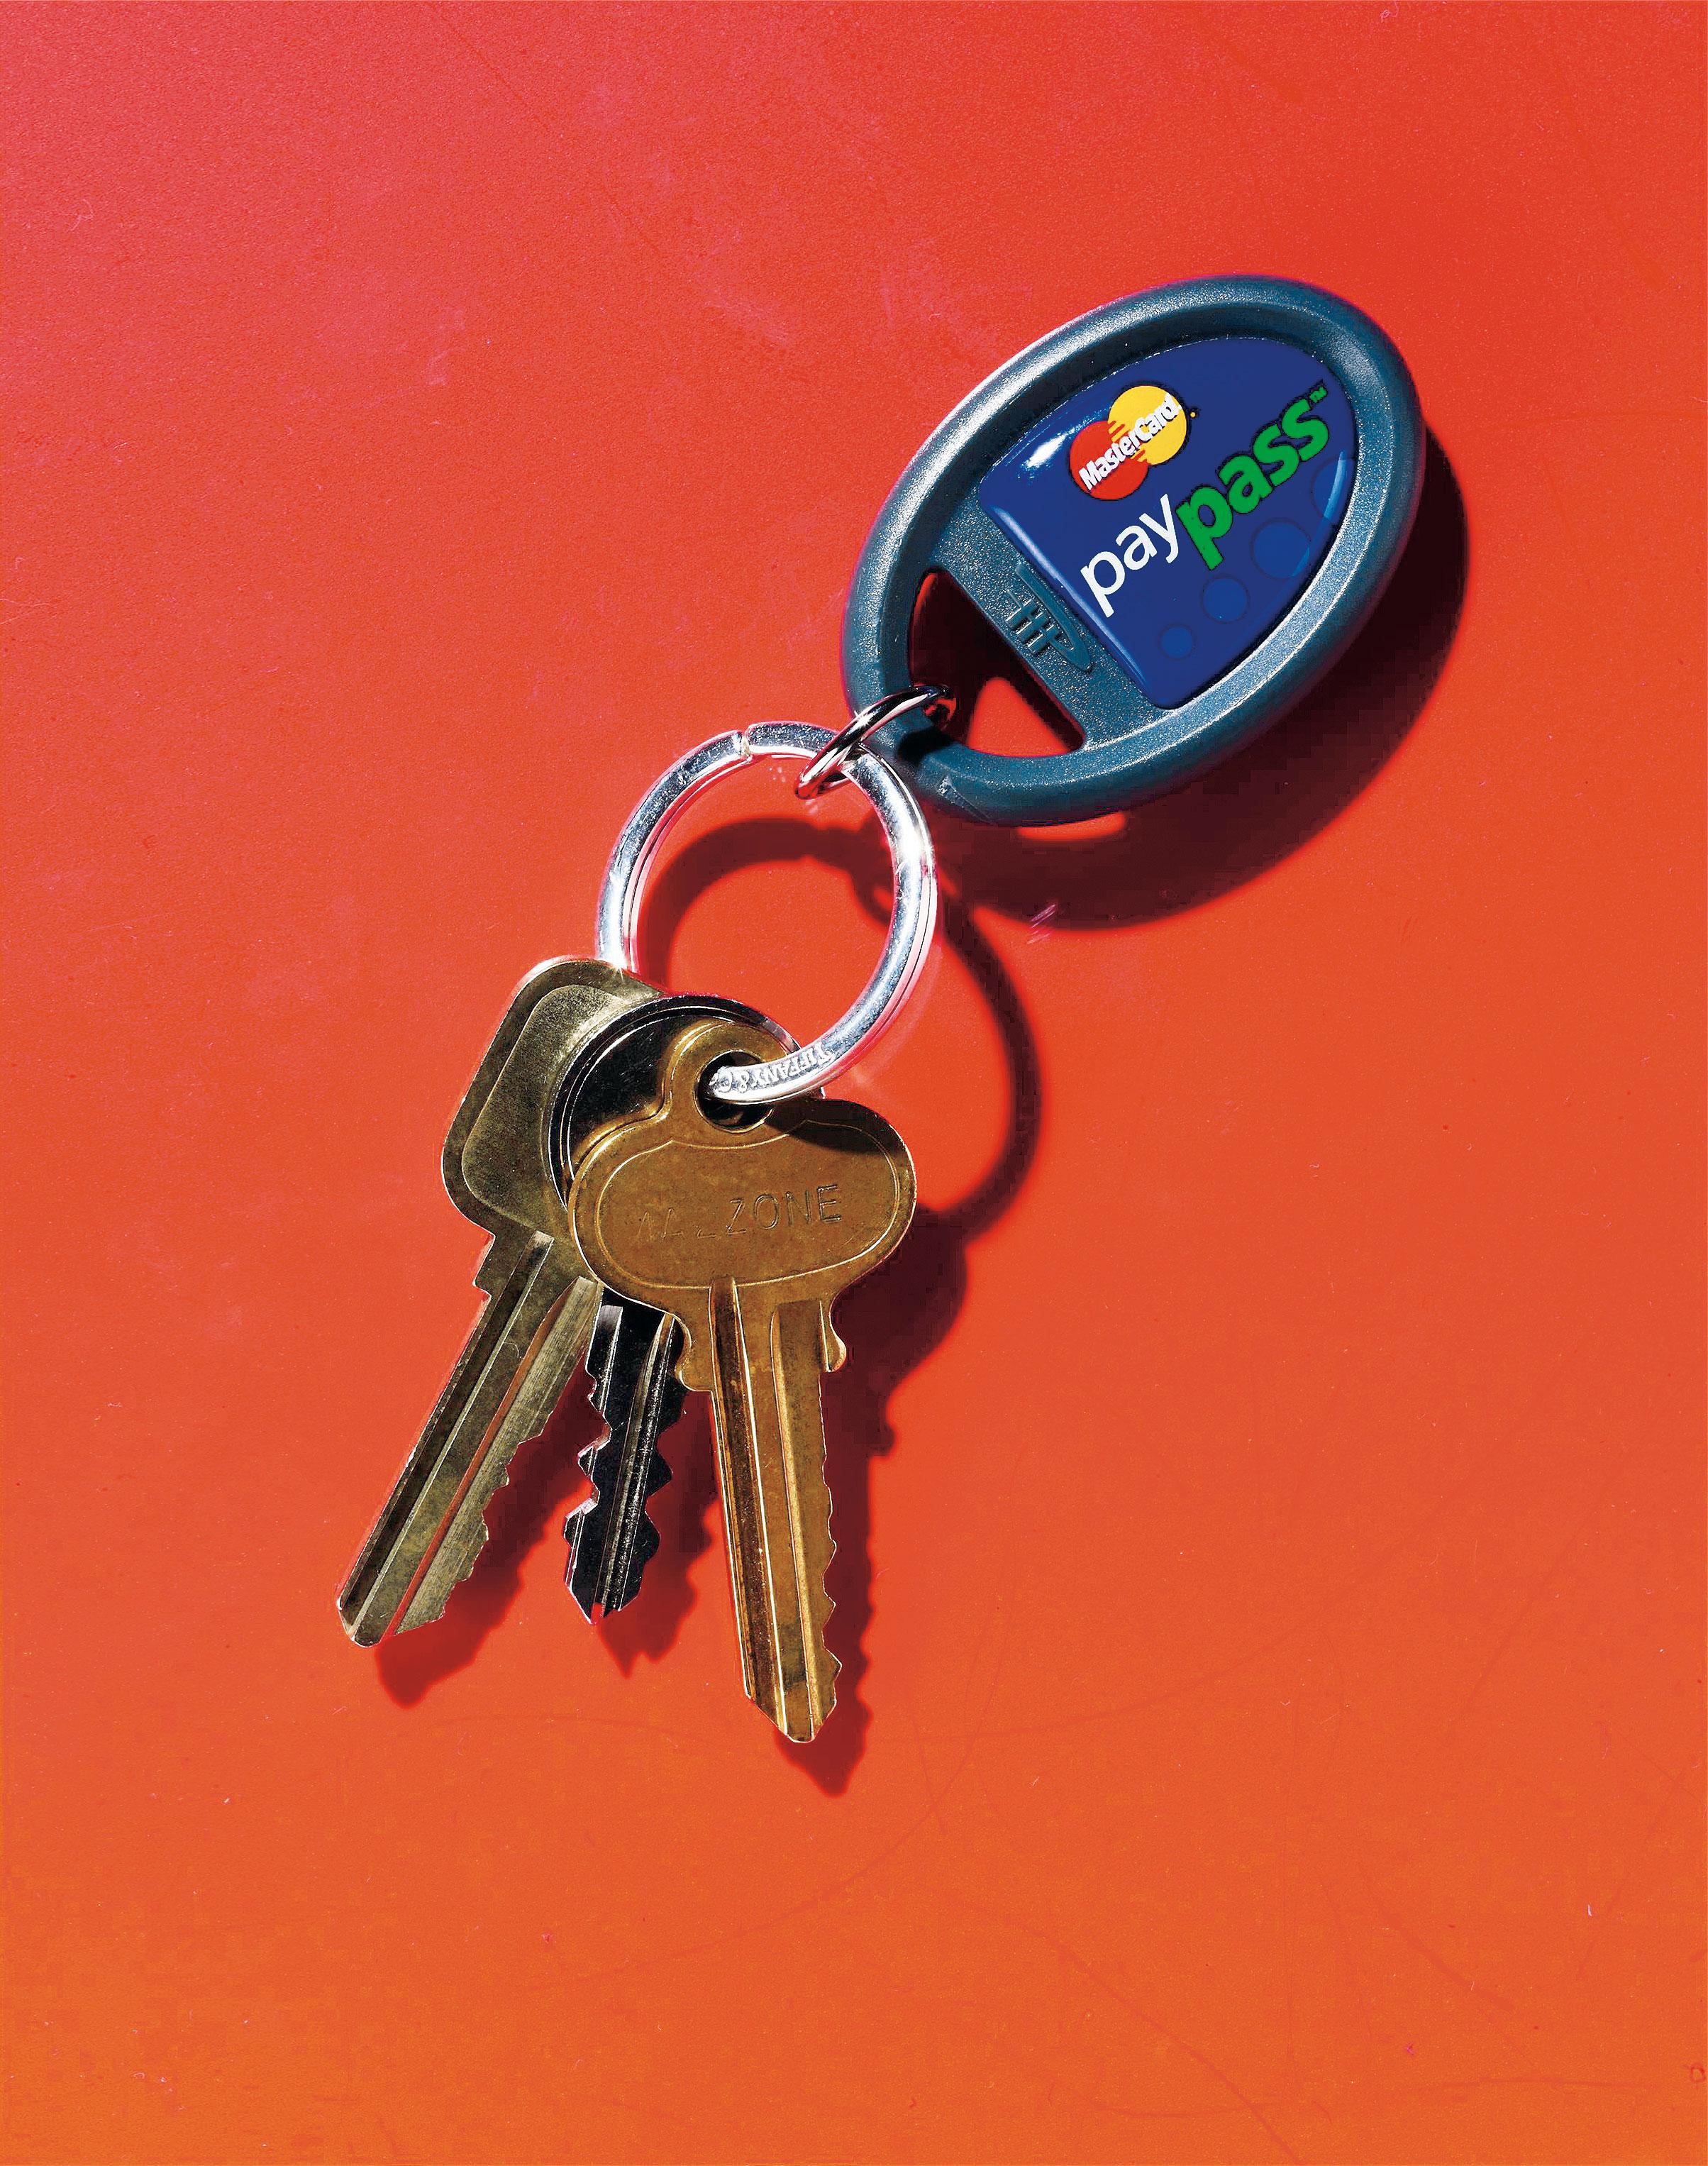 Mastercard key fab. October 2008